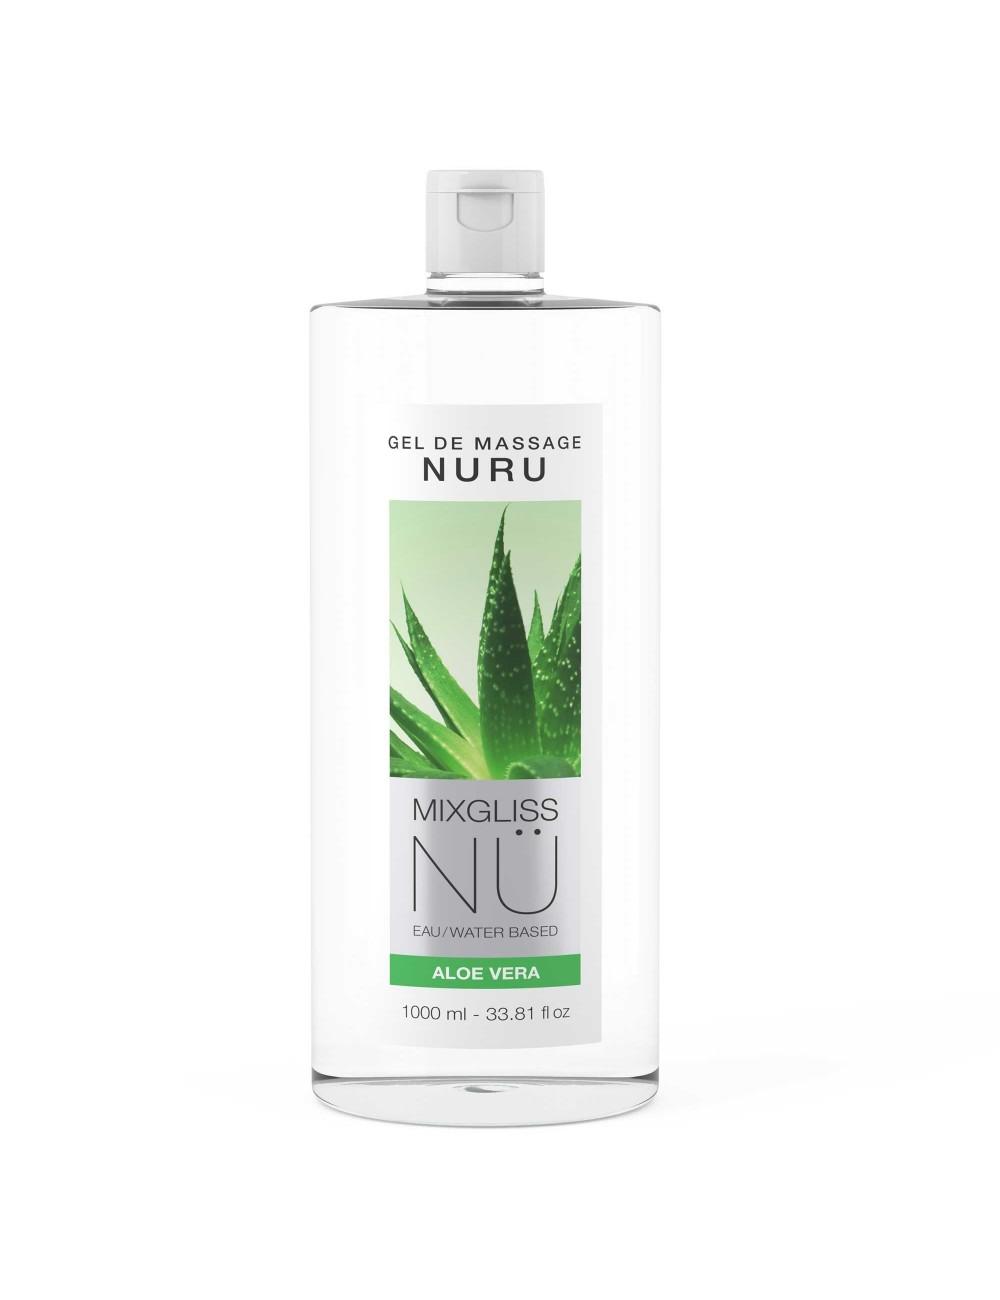 Mixgliss Gel de massage - NU Aloe Vera 1000 ml - Huiles de massage - Mixgliss